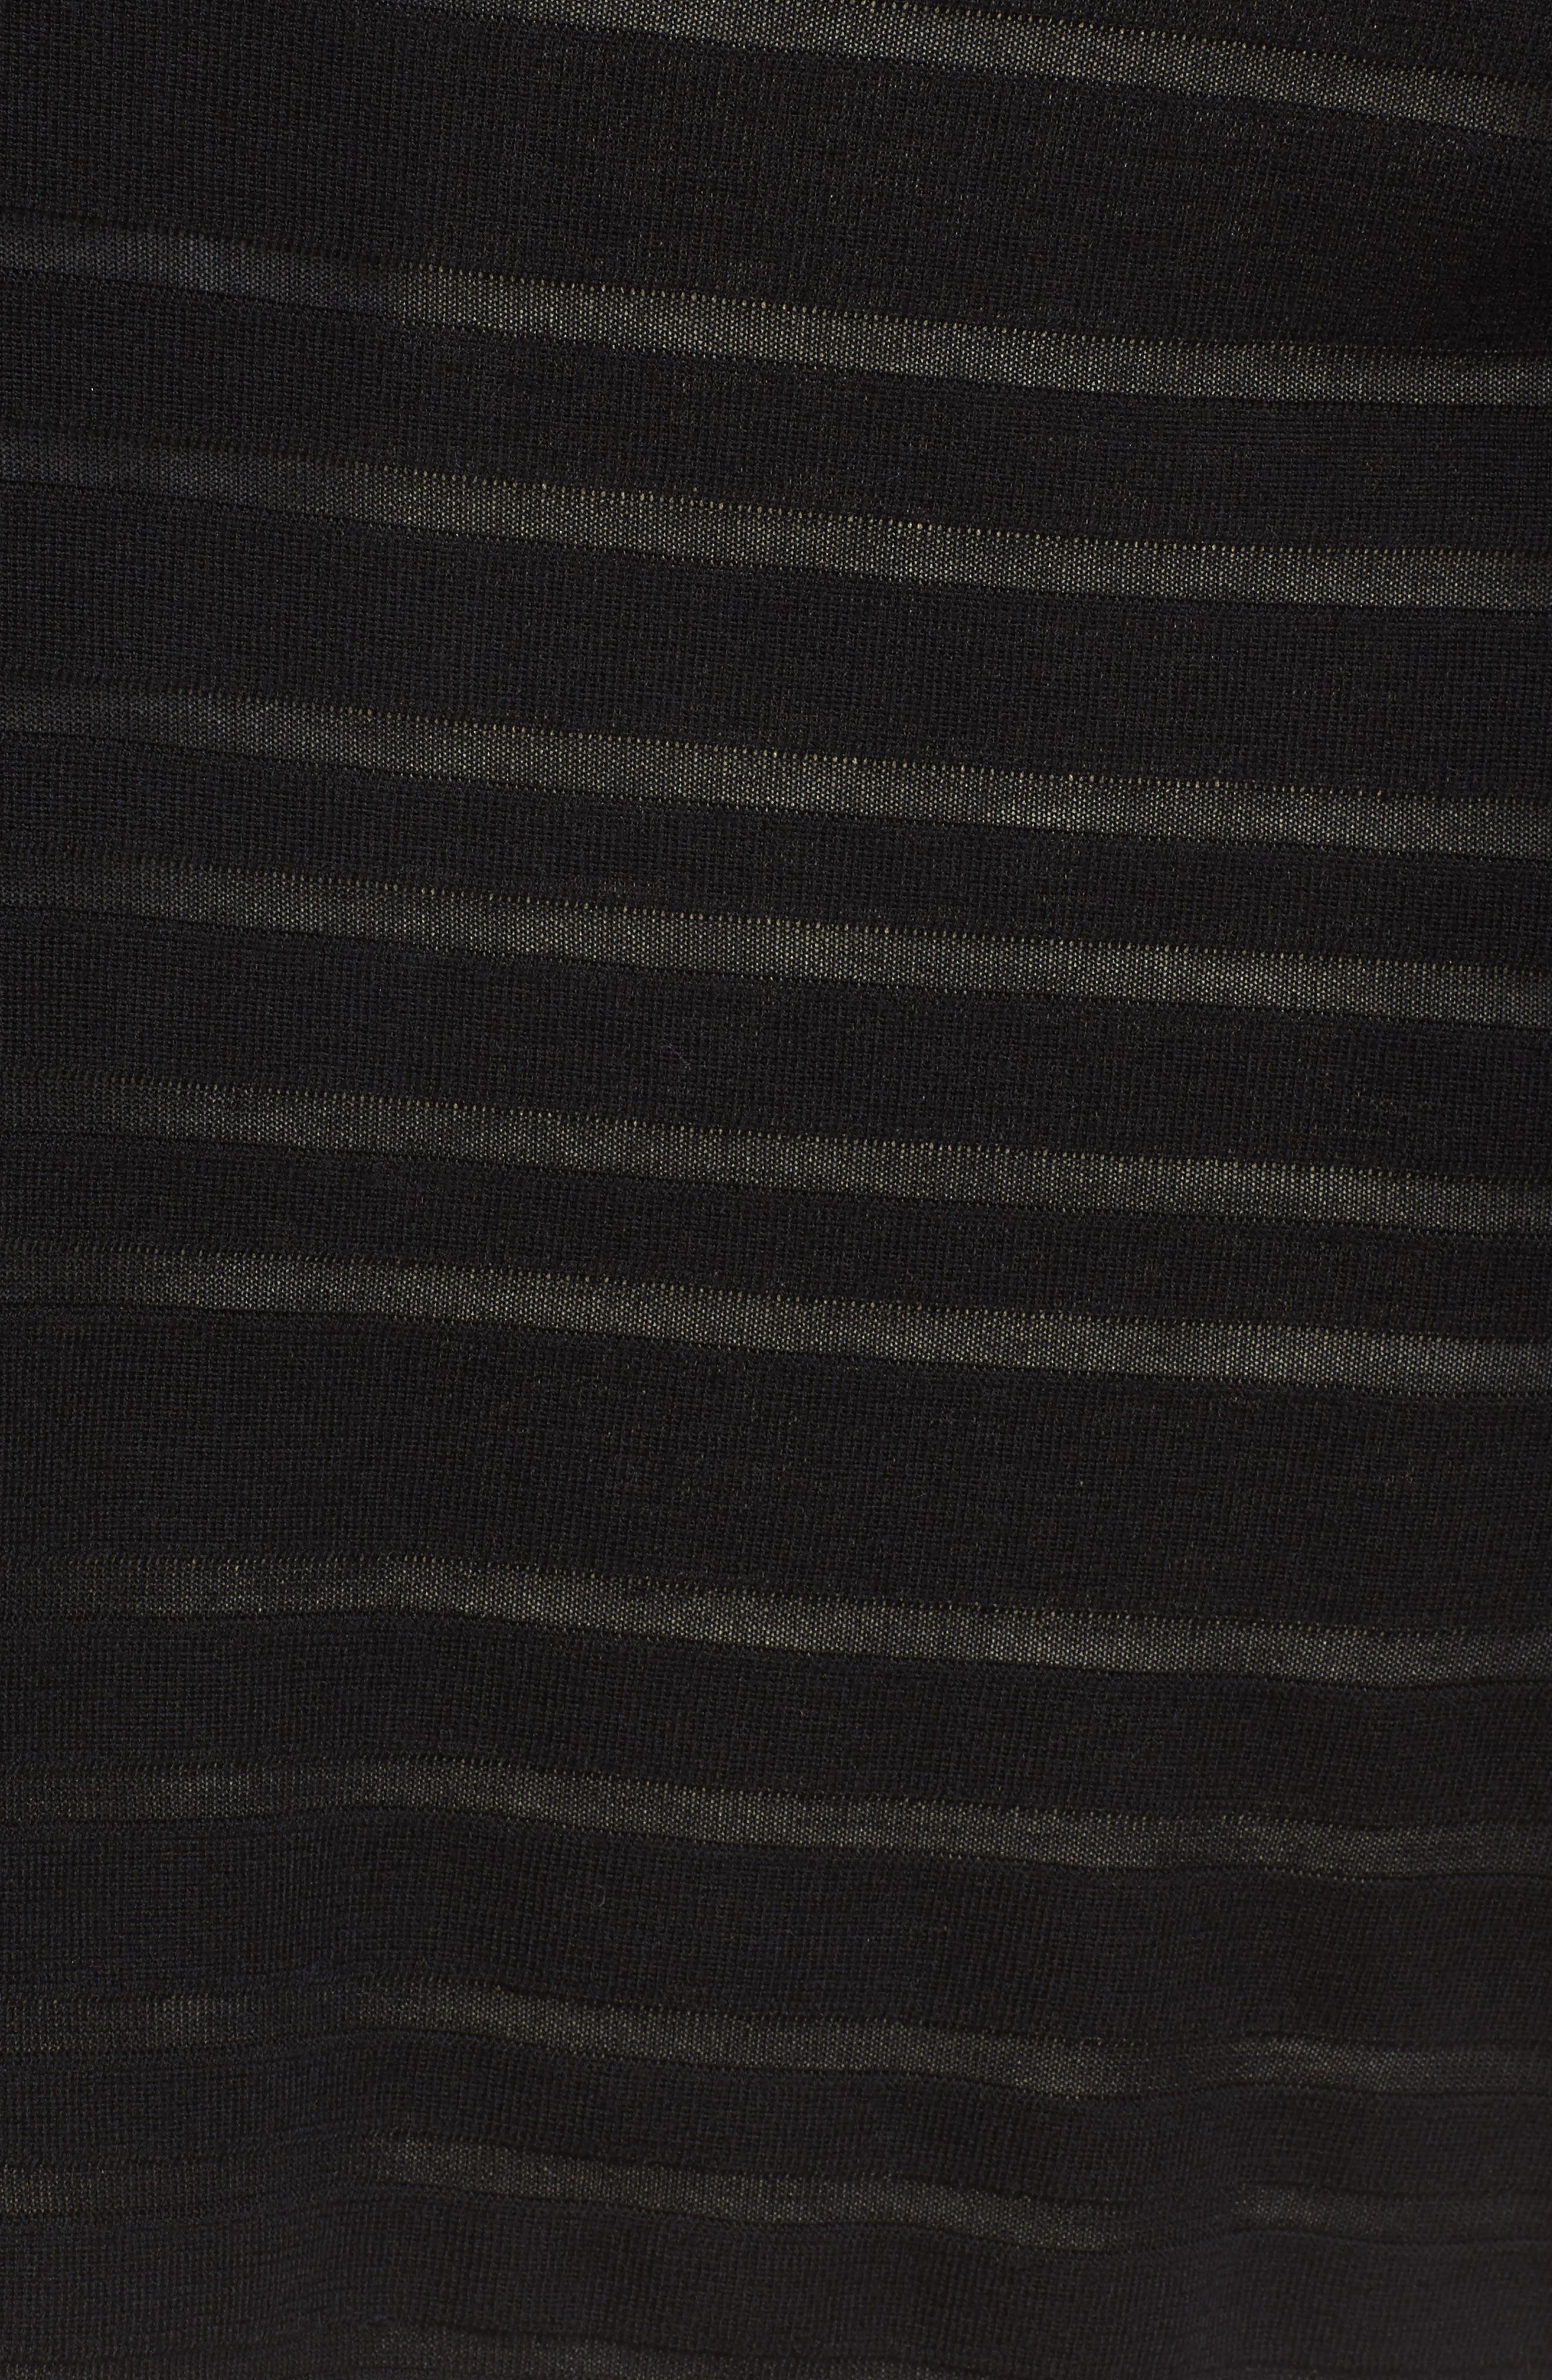 Fahsa Stripe Textured Wool Cardigan,                             Alternate thumbnail 5, color,                             Black